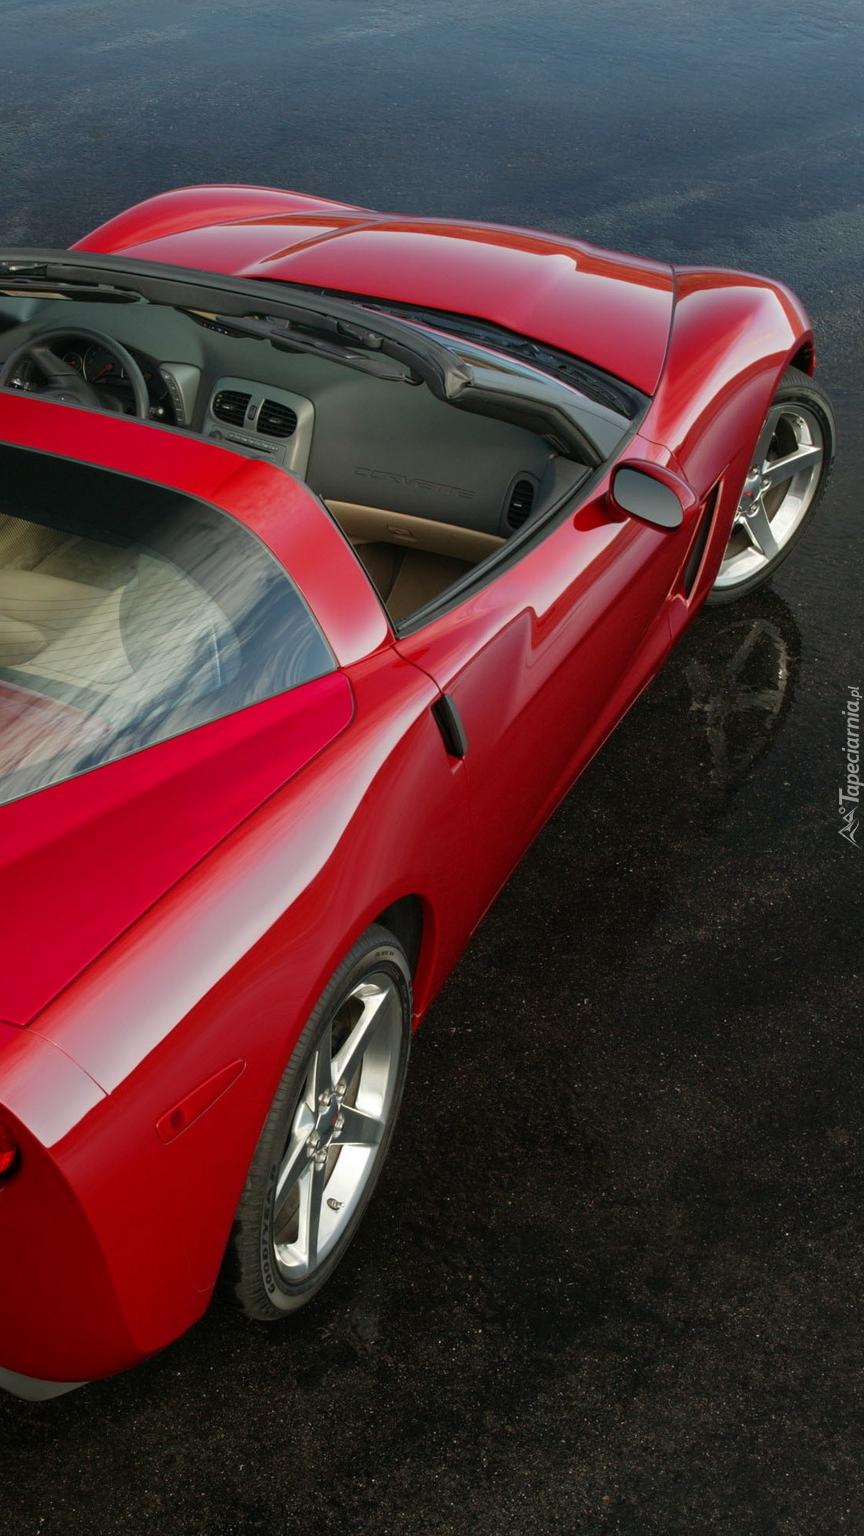 Czerwony Chevrolet Corvette